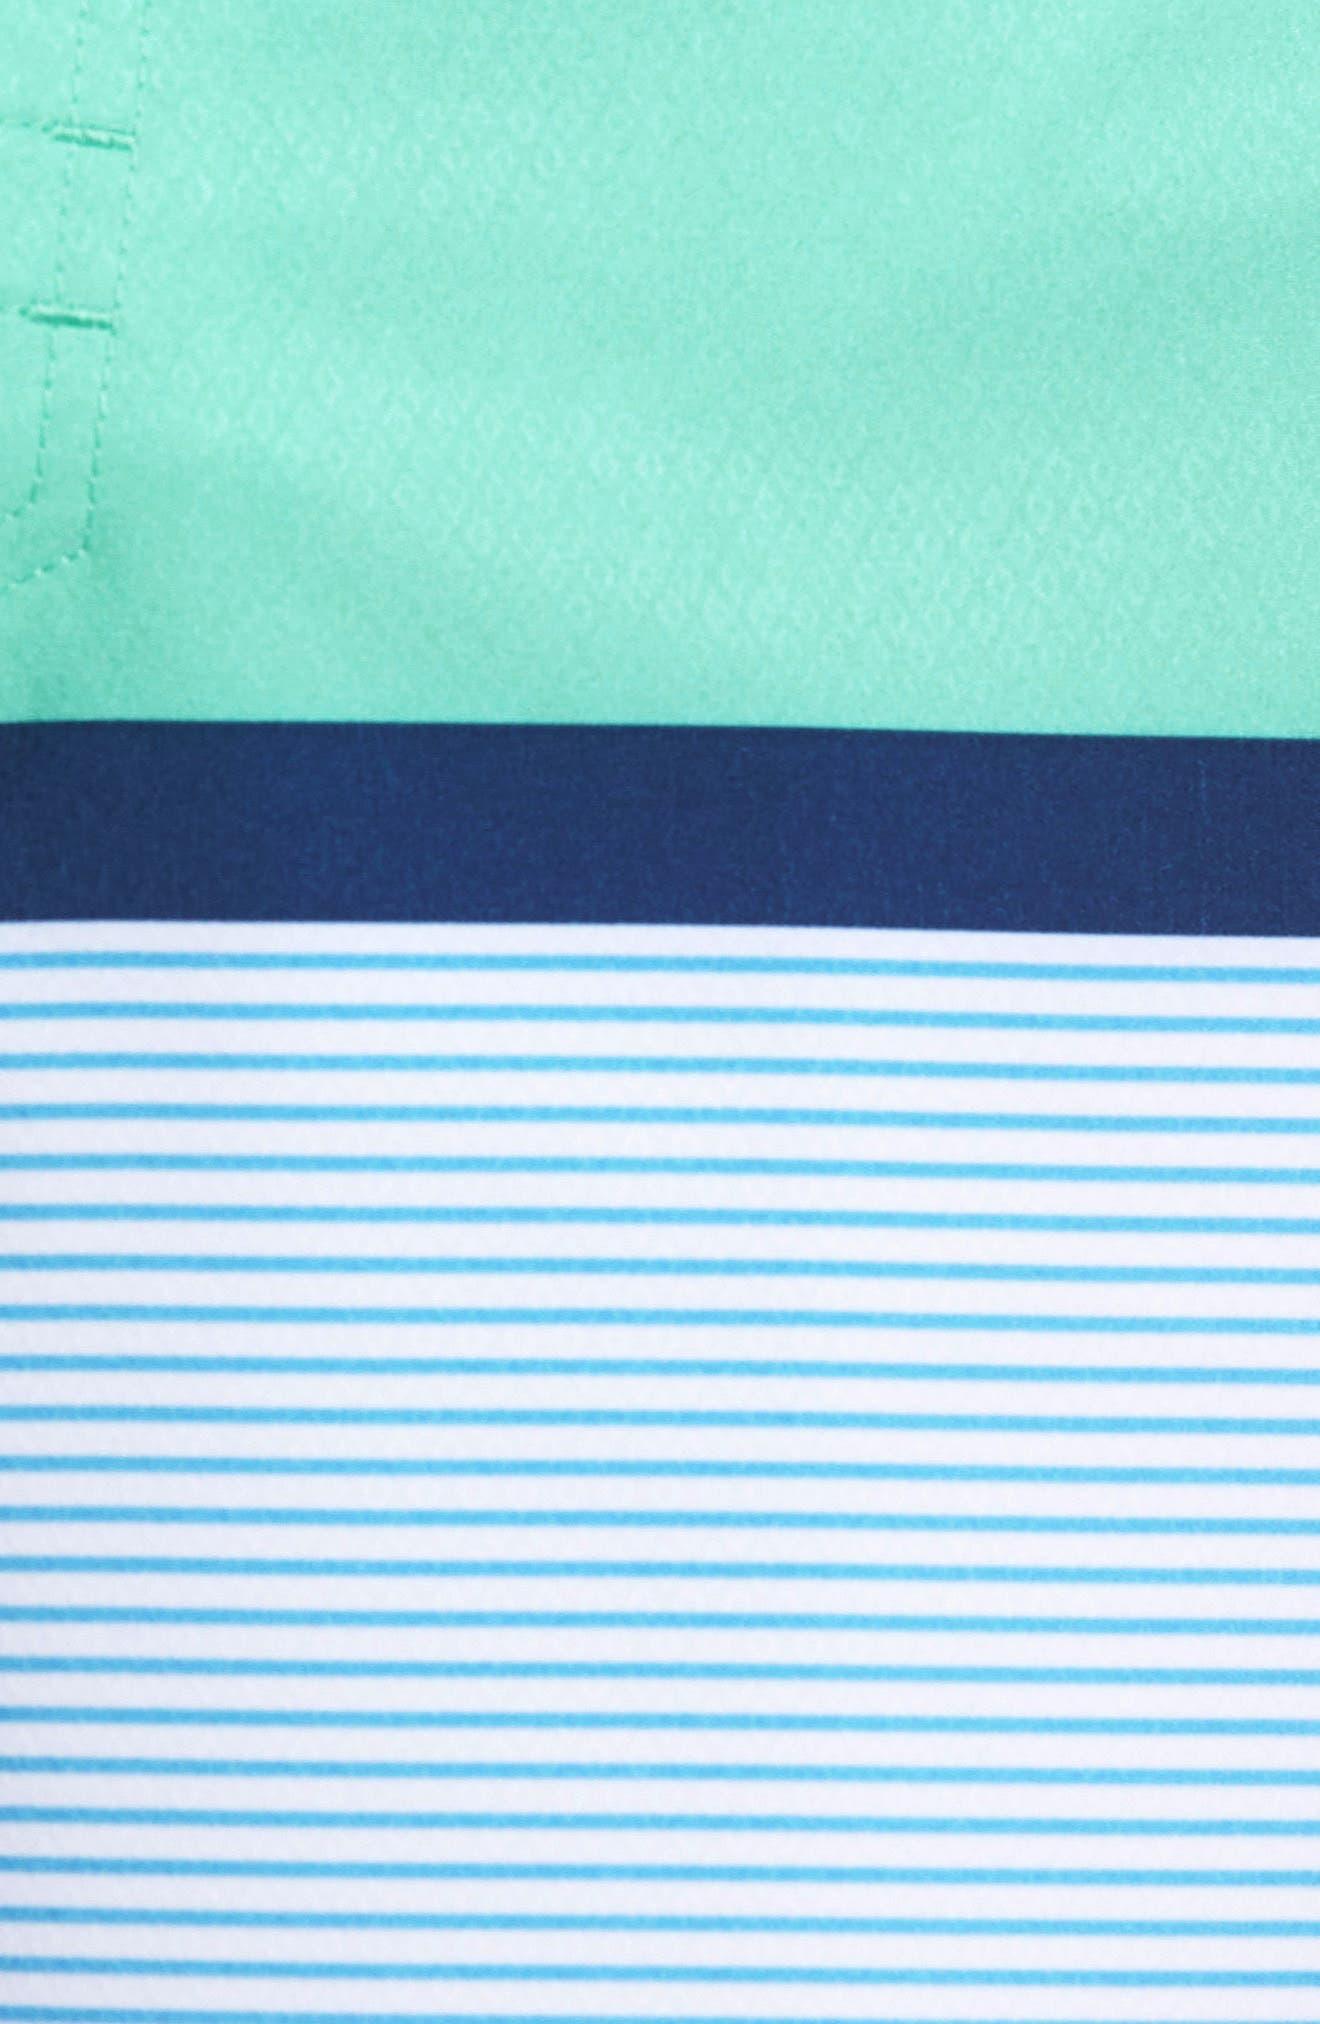 Blue Lagoon Swim Trunks,                             Alternate thumbnail 5, color,                             400